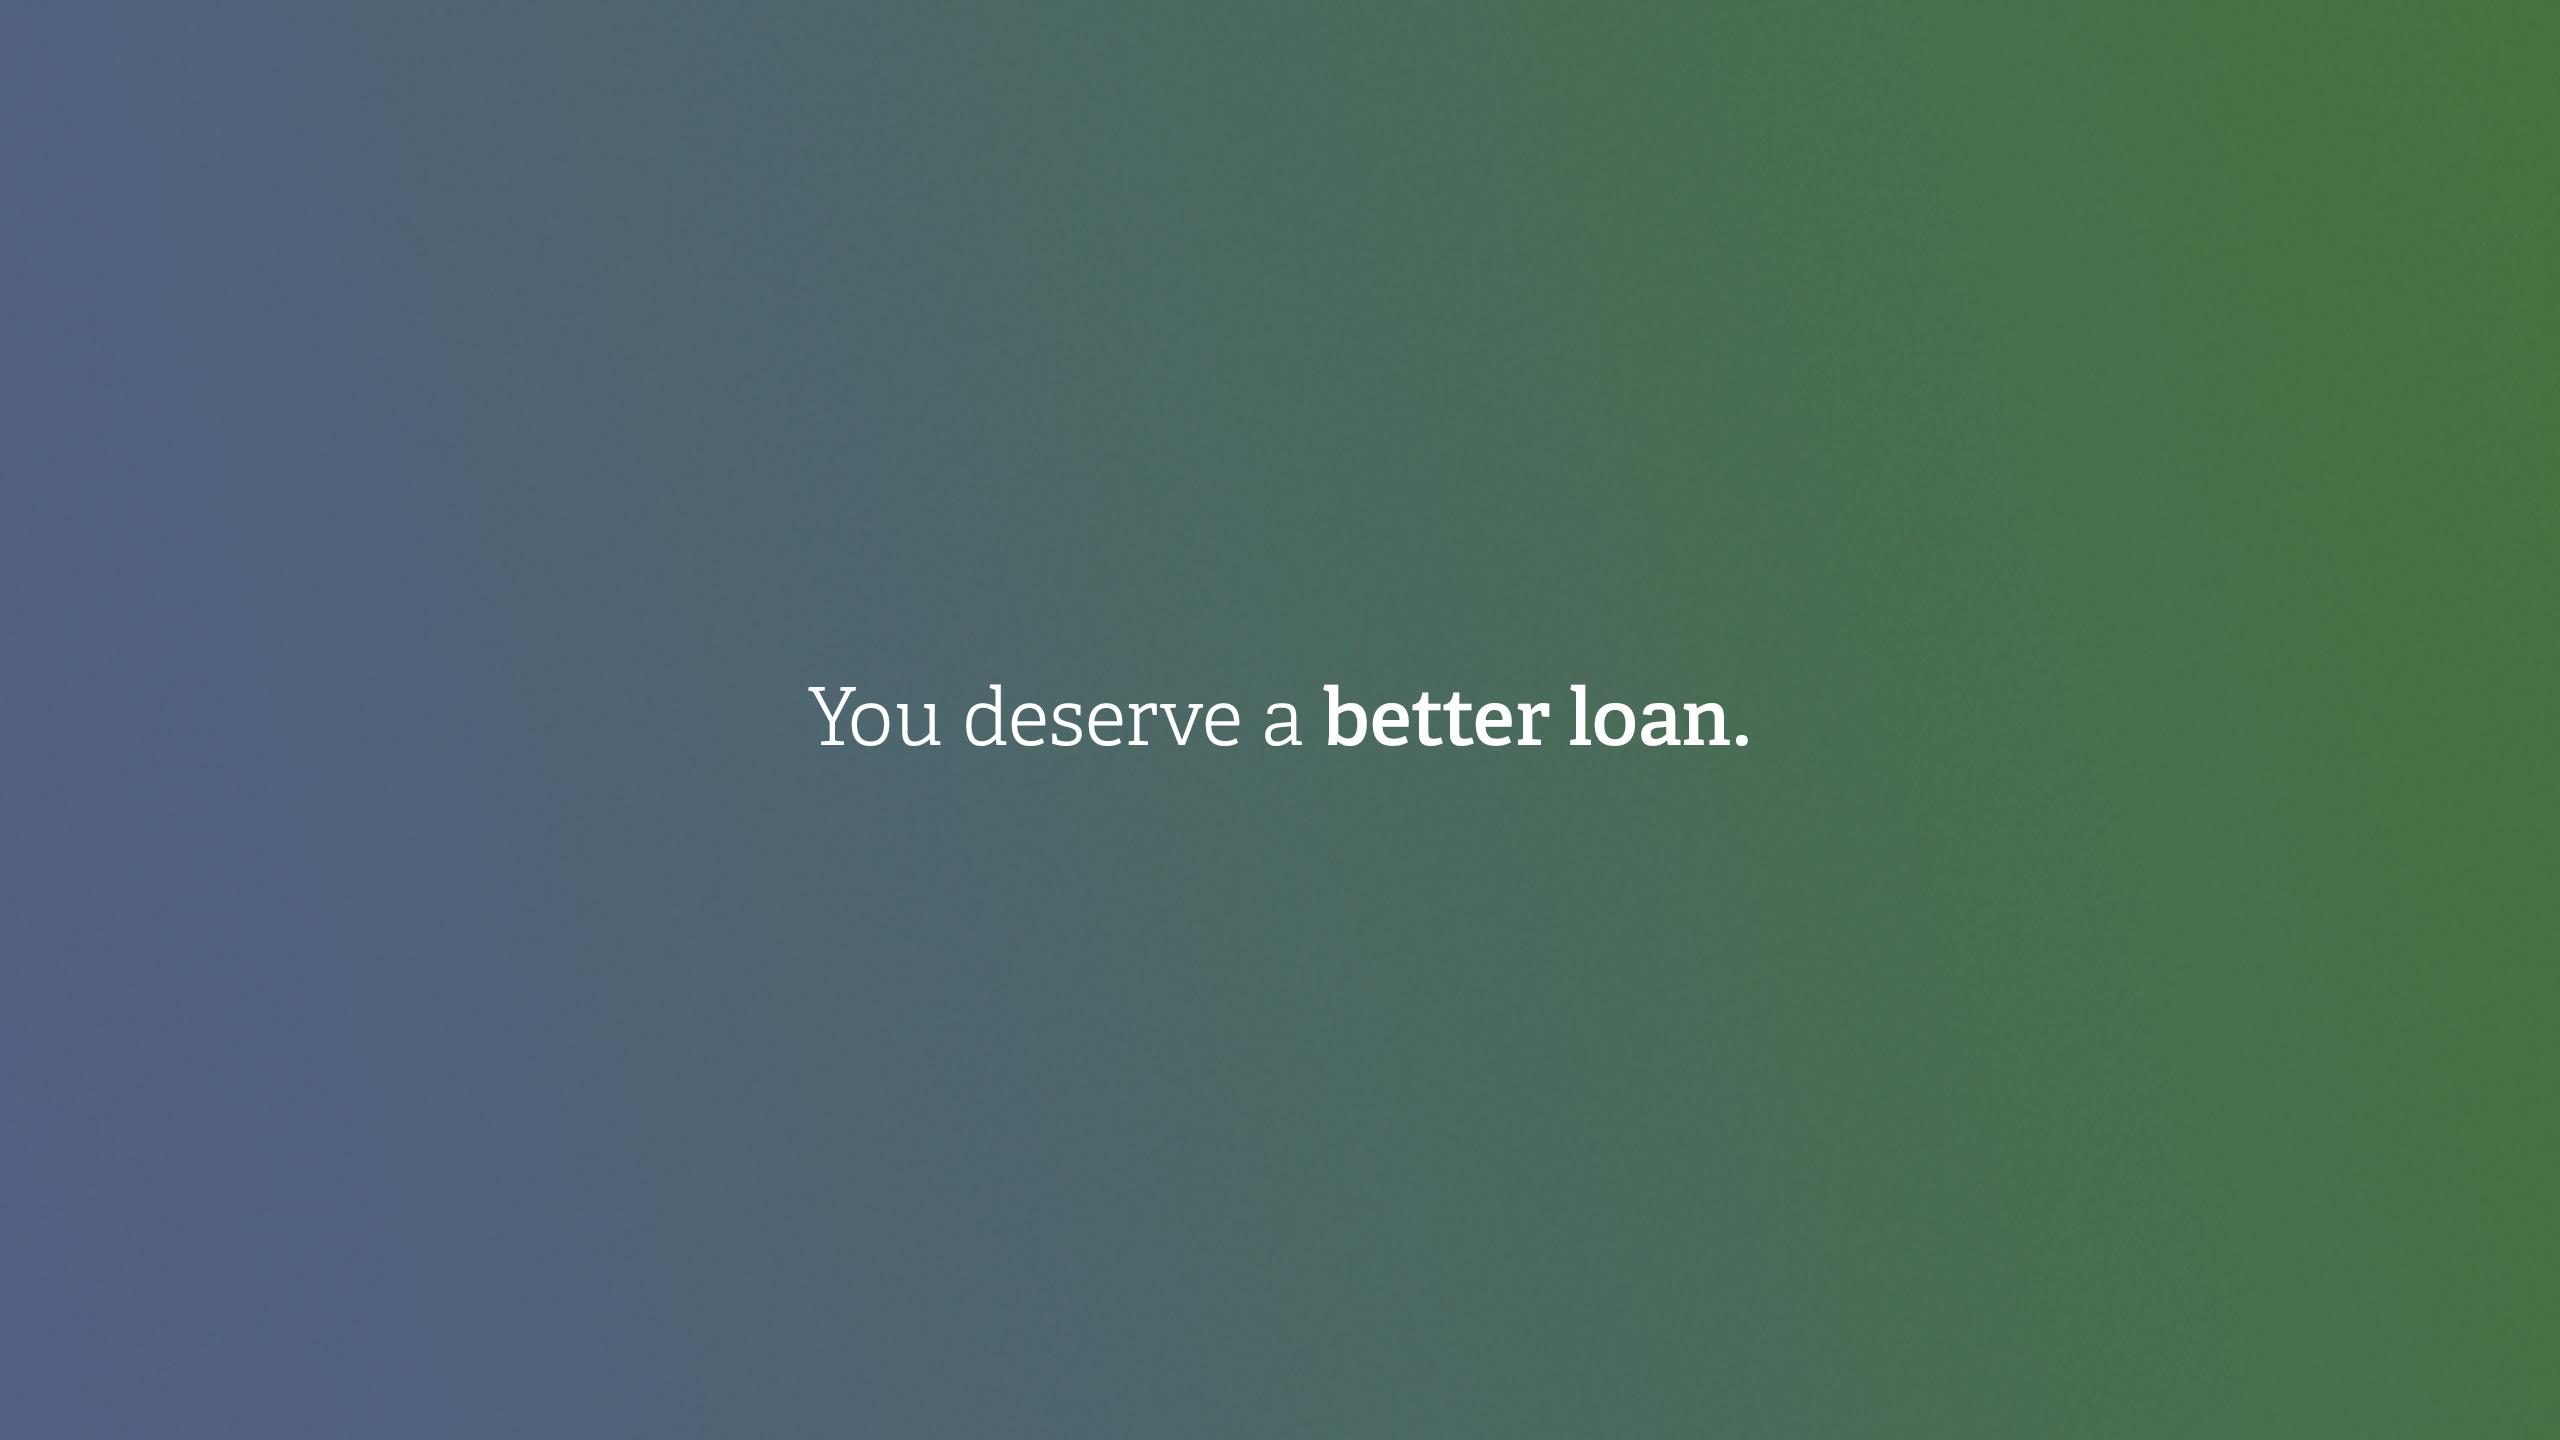 Instant cash loans online 24/7 image 5